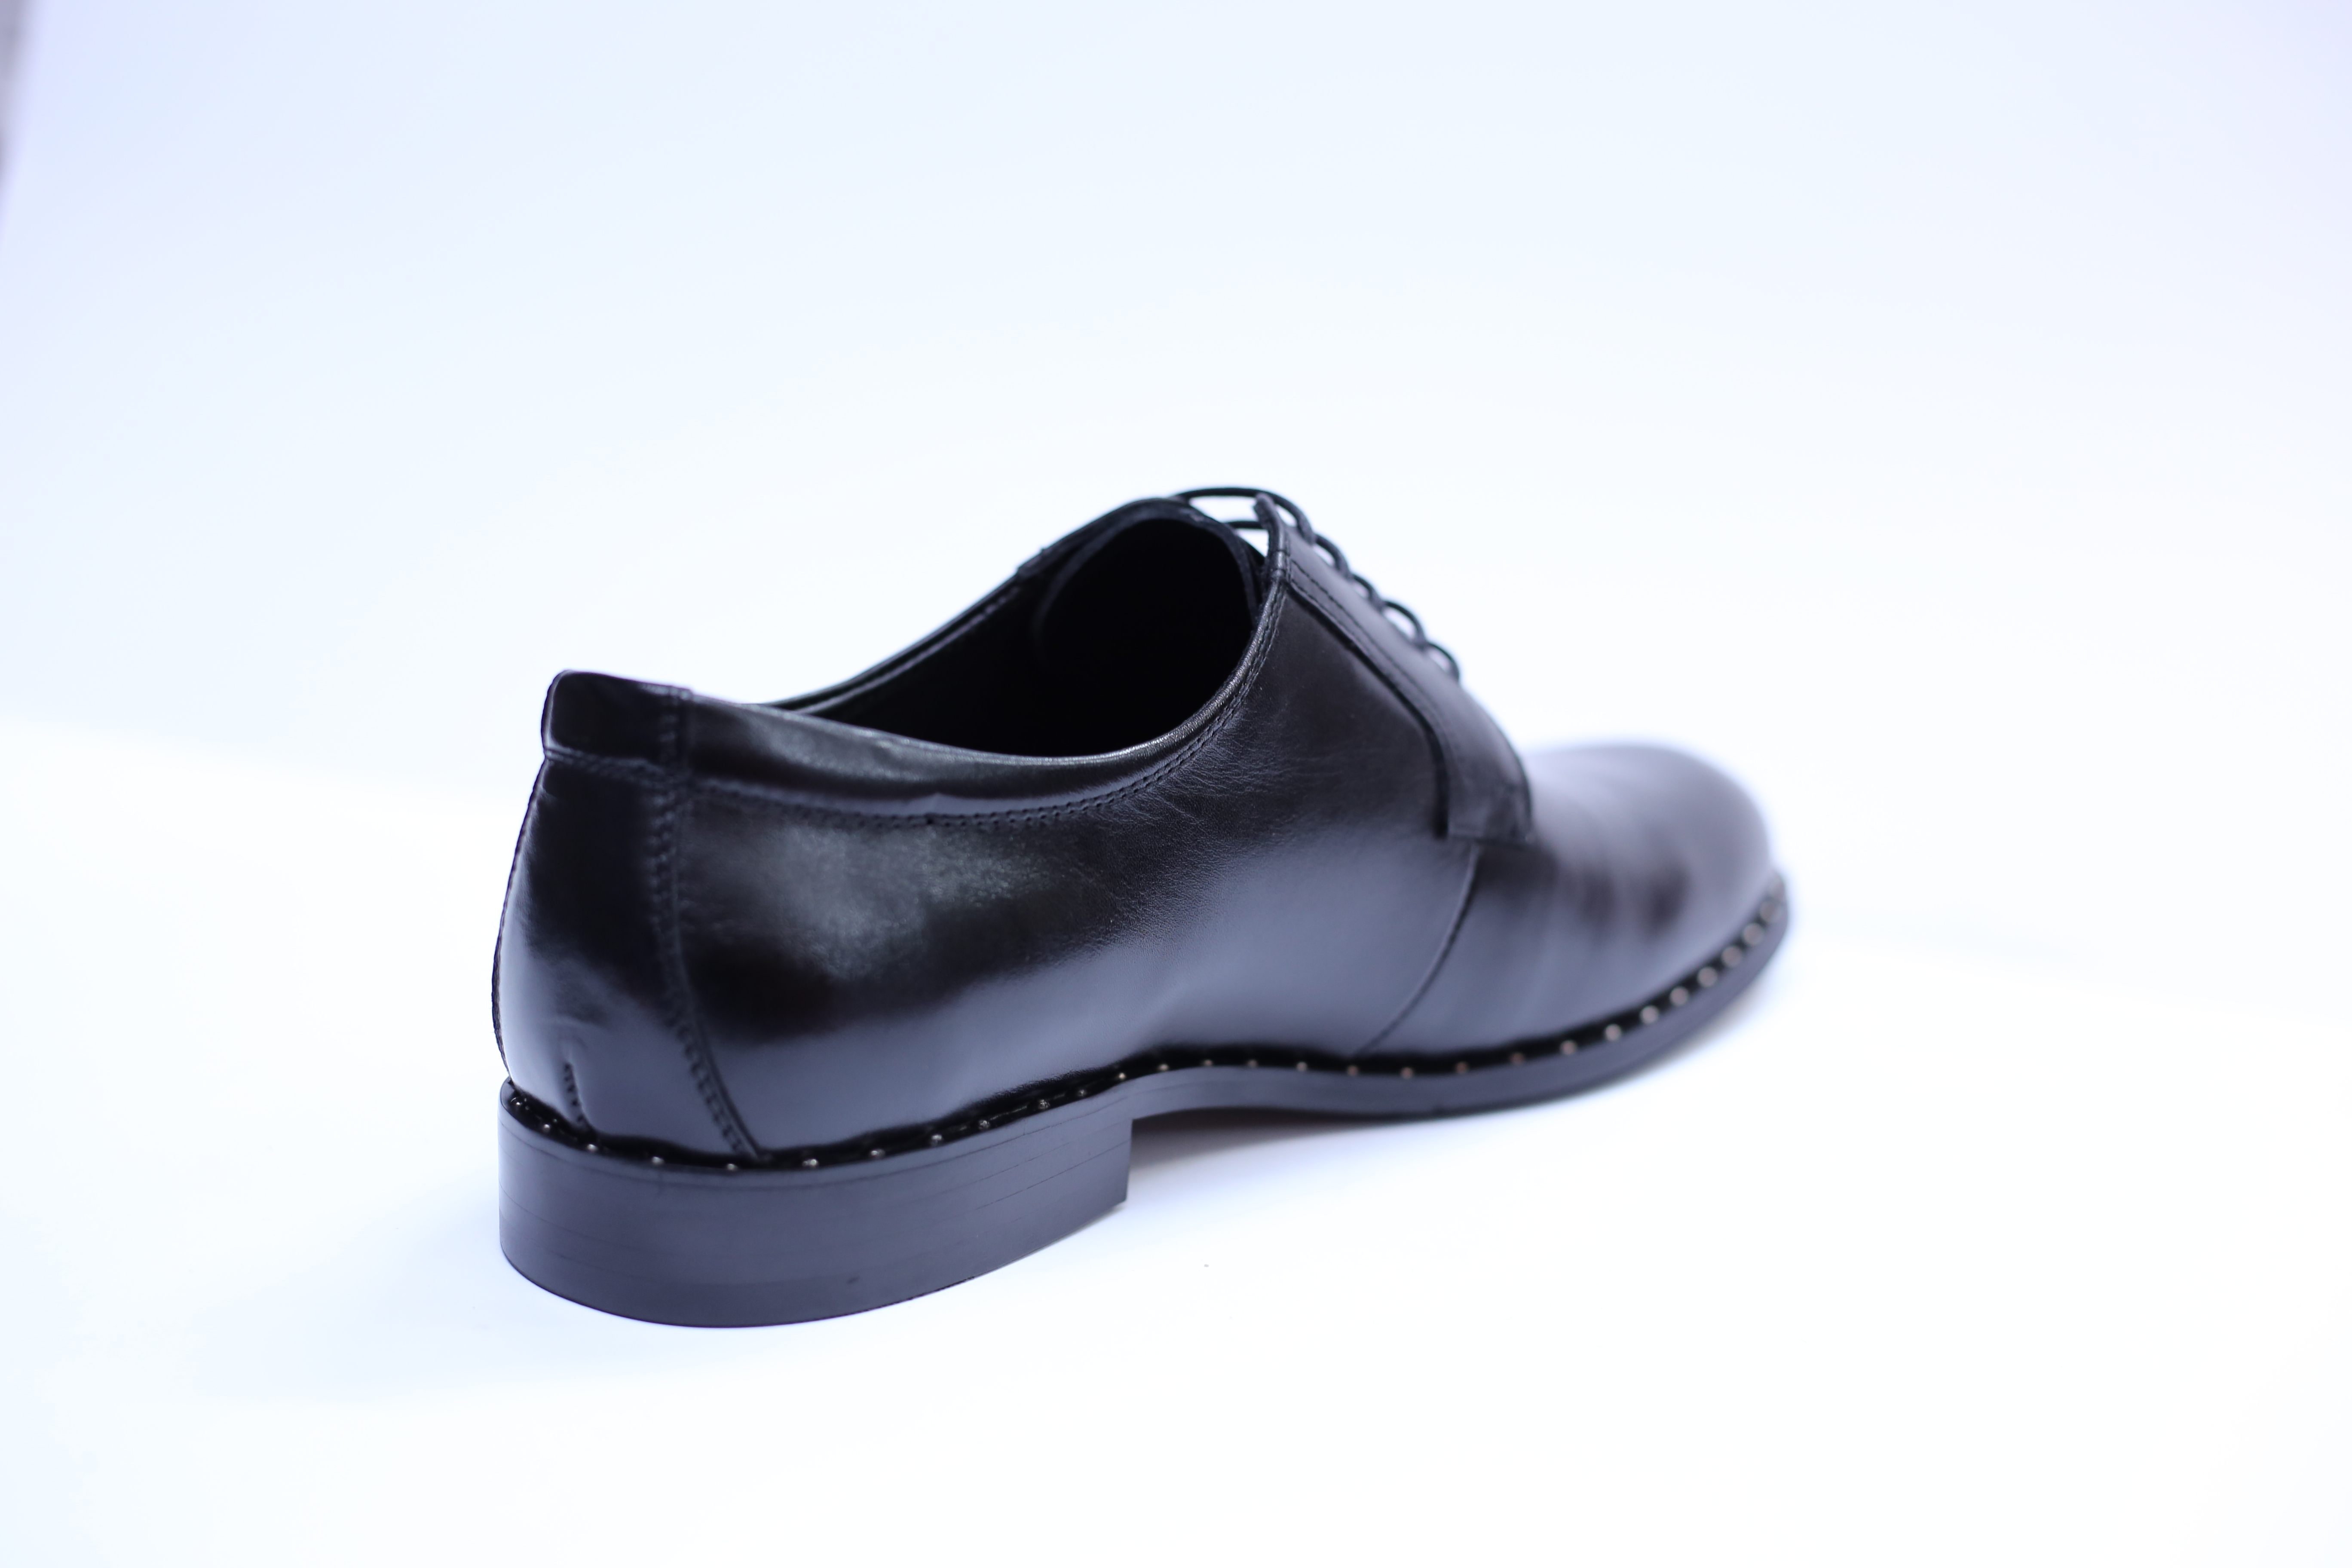 Pantofi barbati din piele naturala, Van, SACCIO, Negru, 39 EU [3]